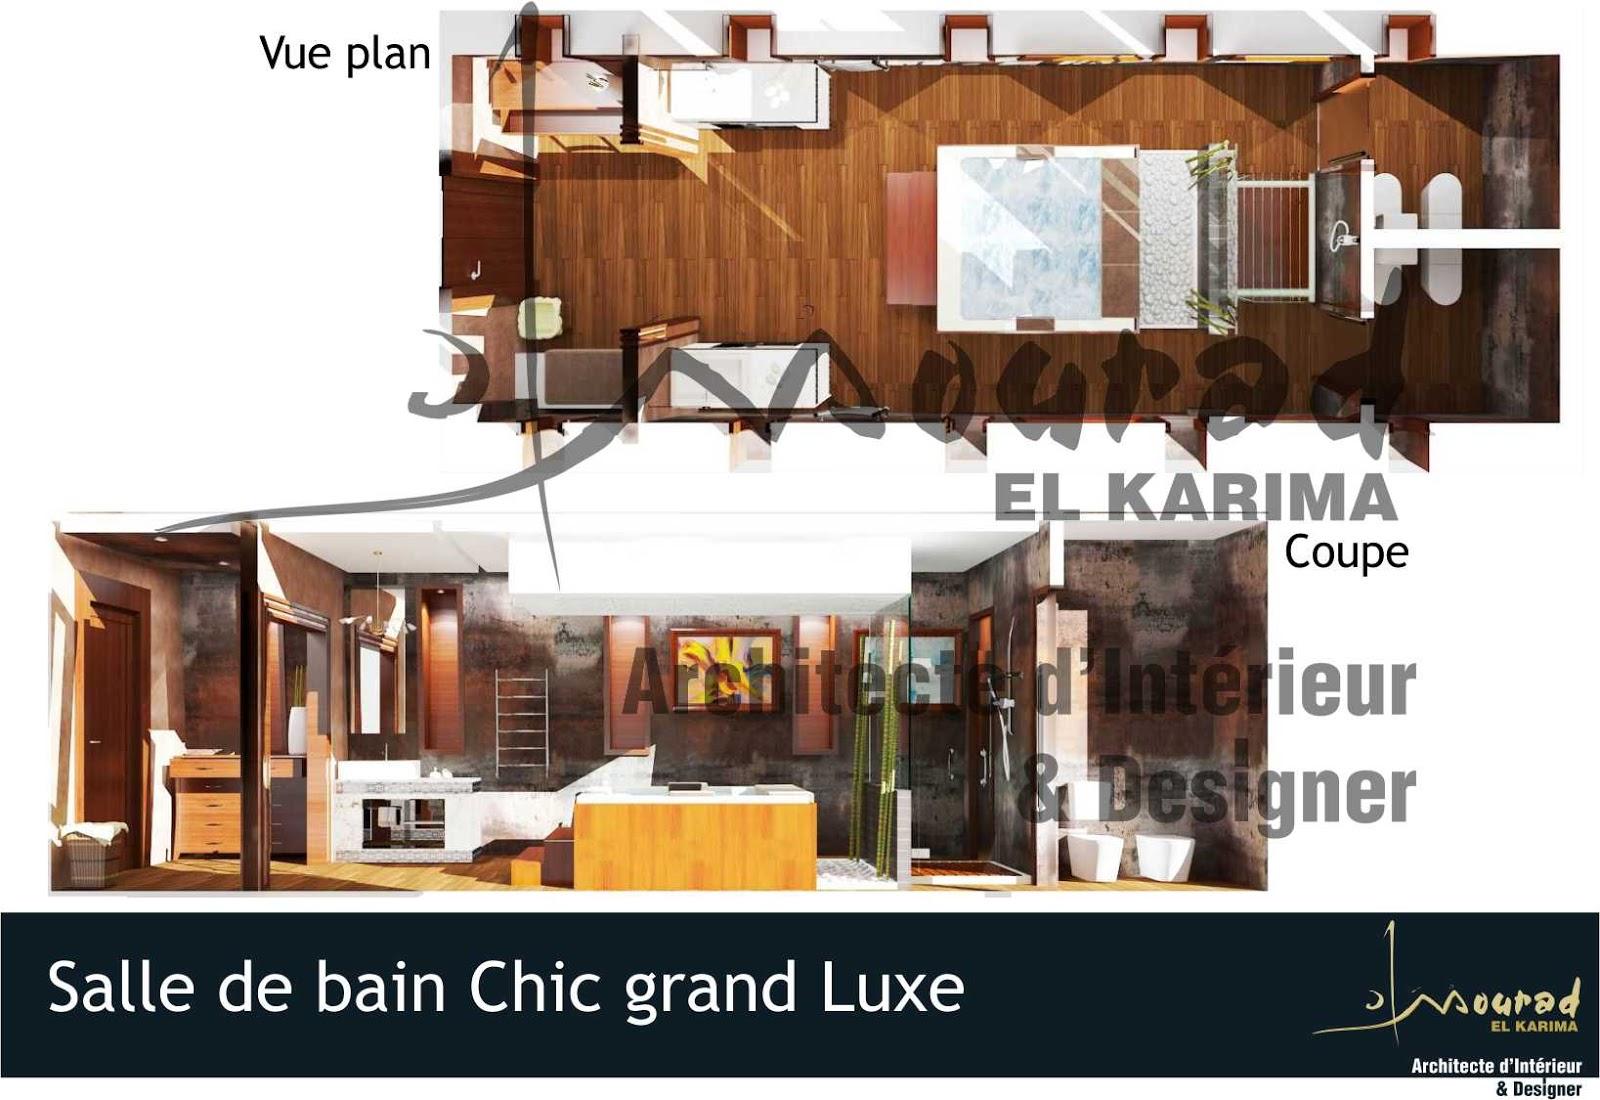 Salle de bain chic grand luxe mourad el karima for Architecte interieur salle de bain